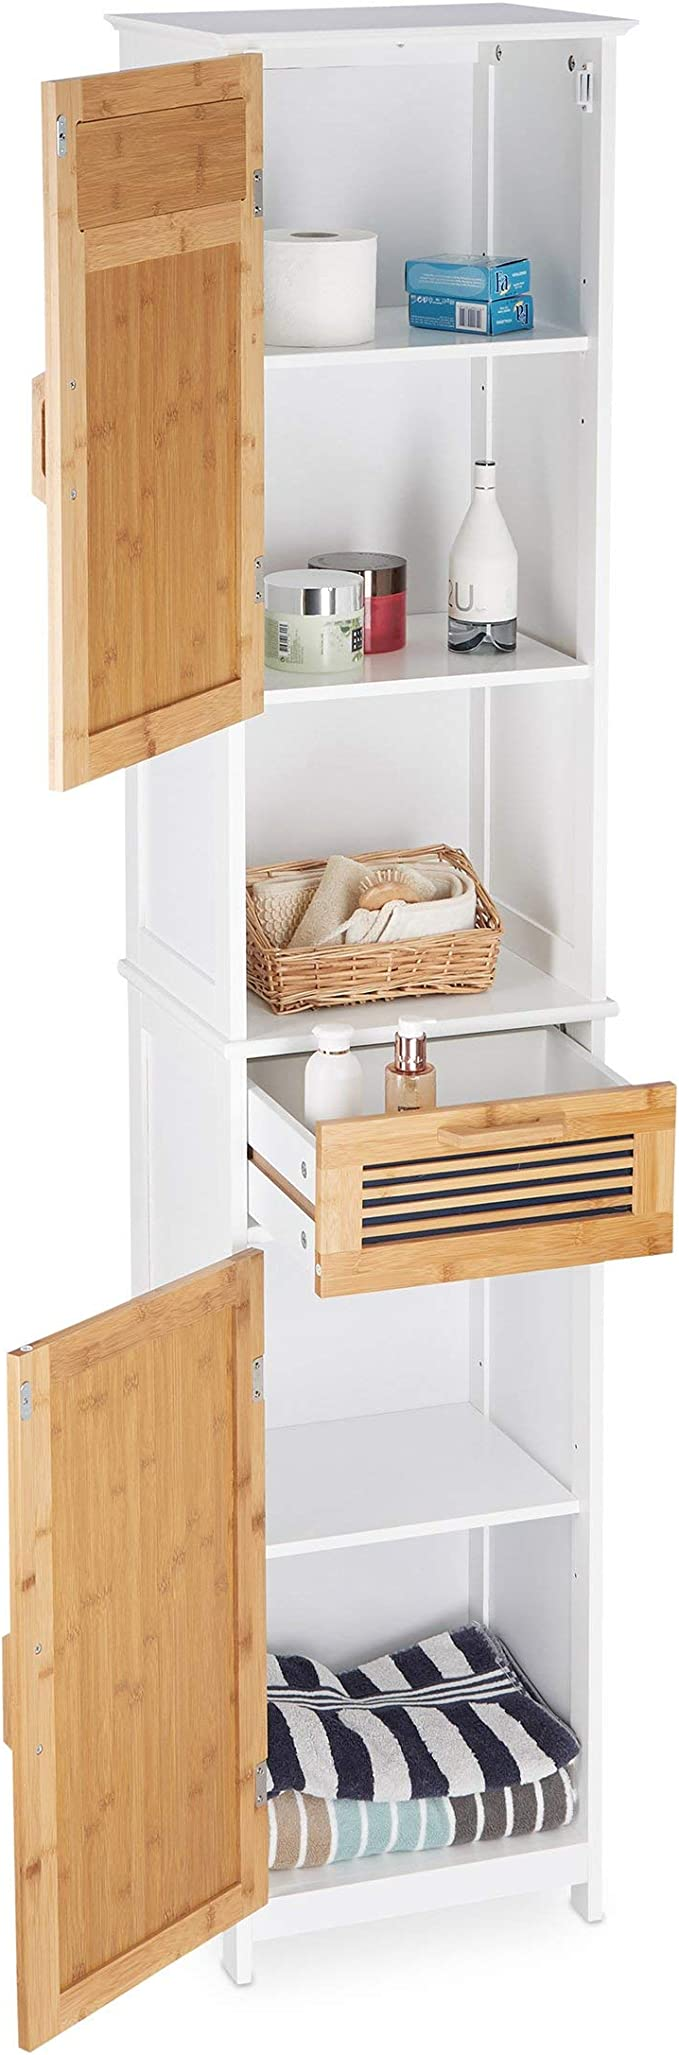 Amazon Com Relaxdays 10021846 Bathroom Cabinet 2 Doors 1 Drawer